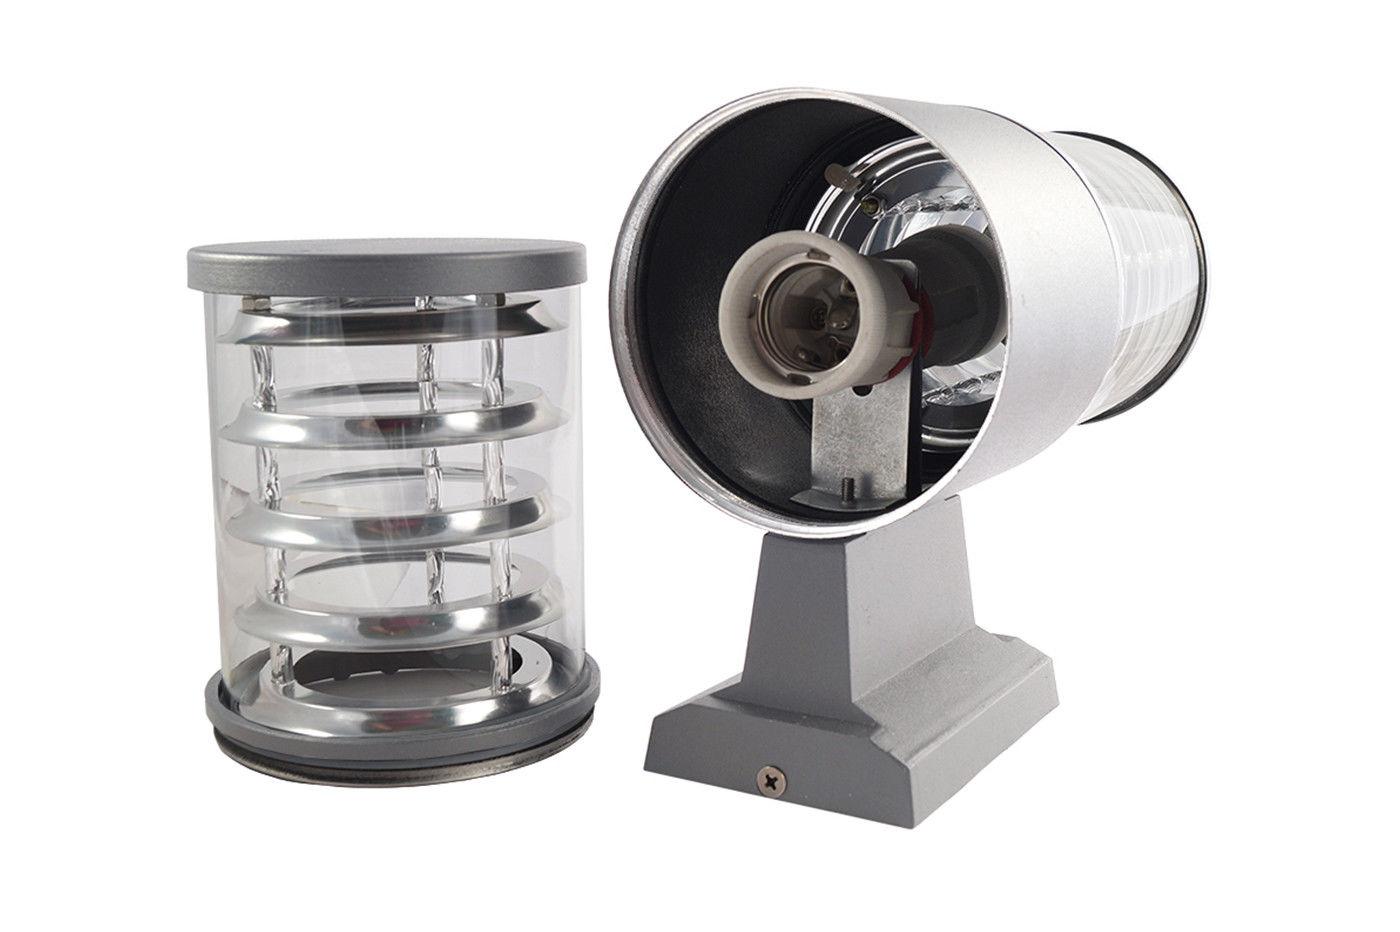 Plafoniera Da Esterno Con Telecamera : Bes applique beselettronica esterno grigio